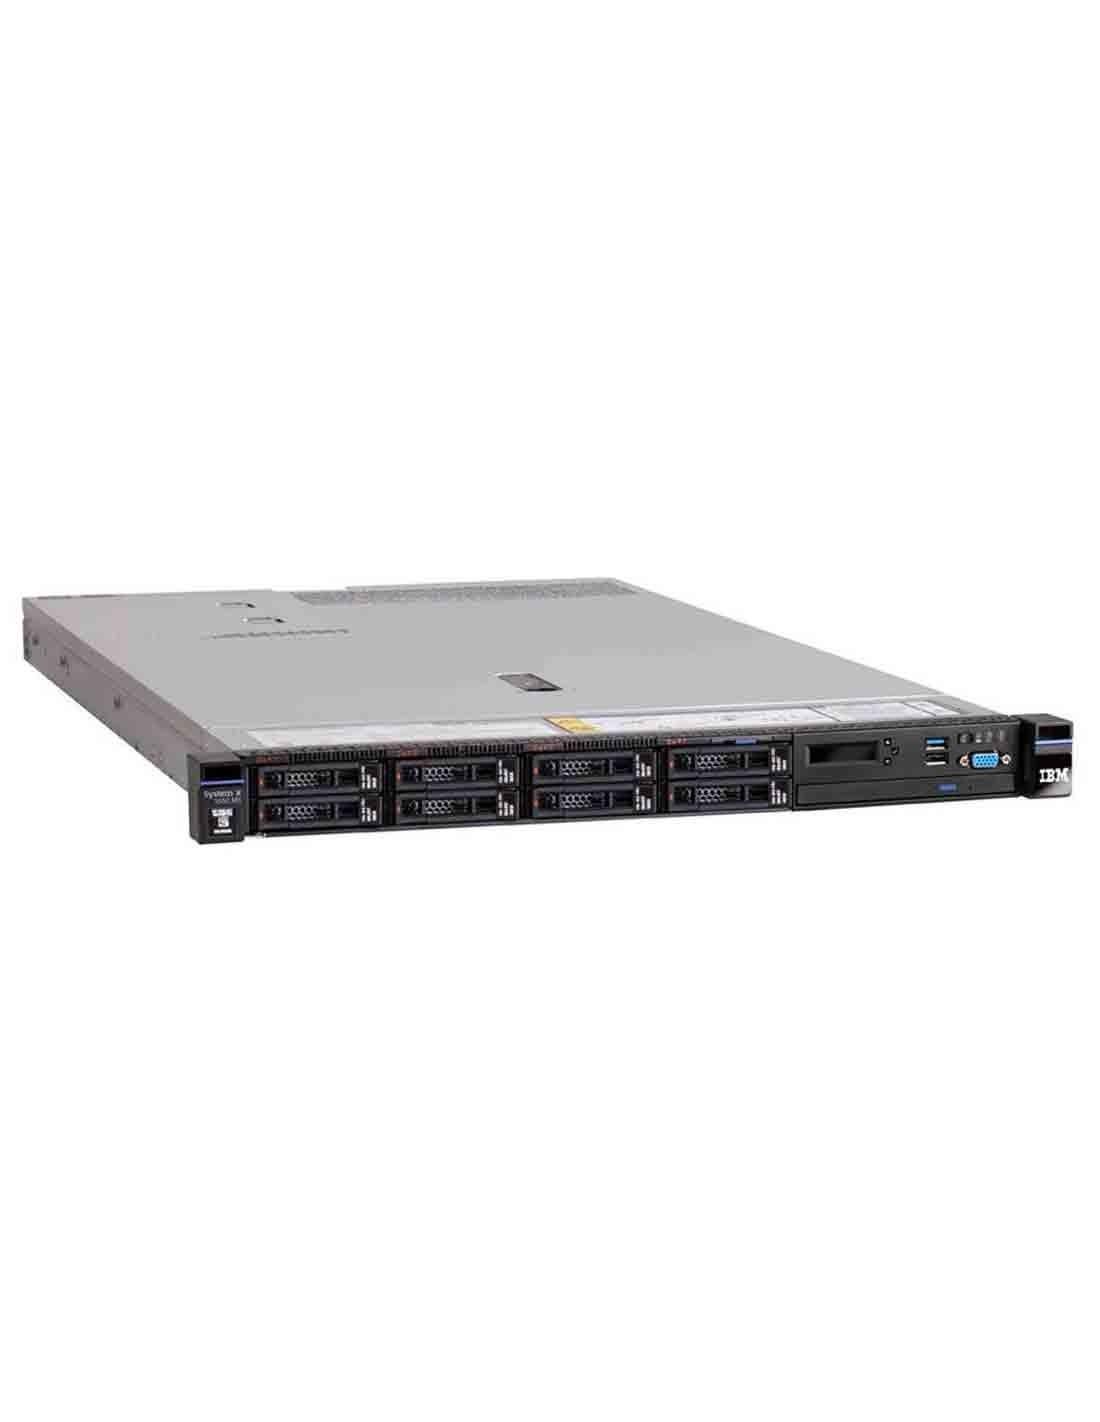 Lenovo x3550 M5 Rack Server E5-2630v4 8869EEG at a Cheap Price in UAE